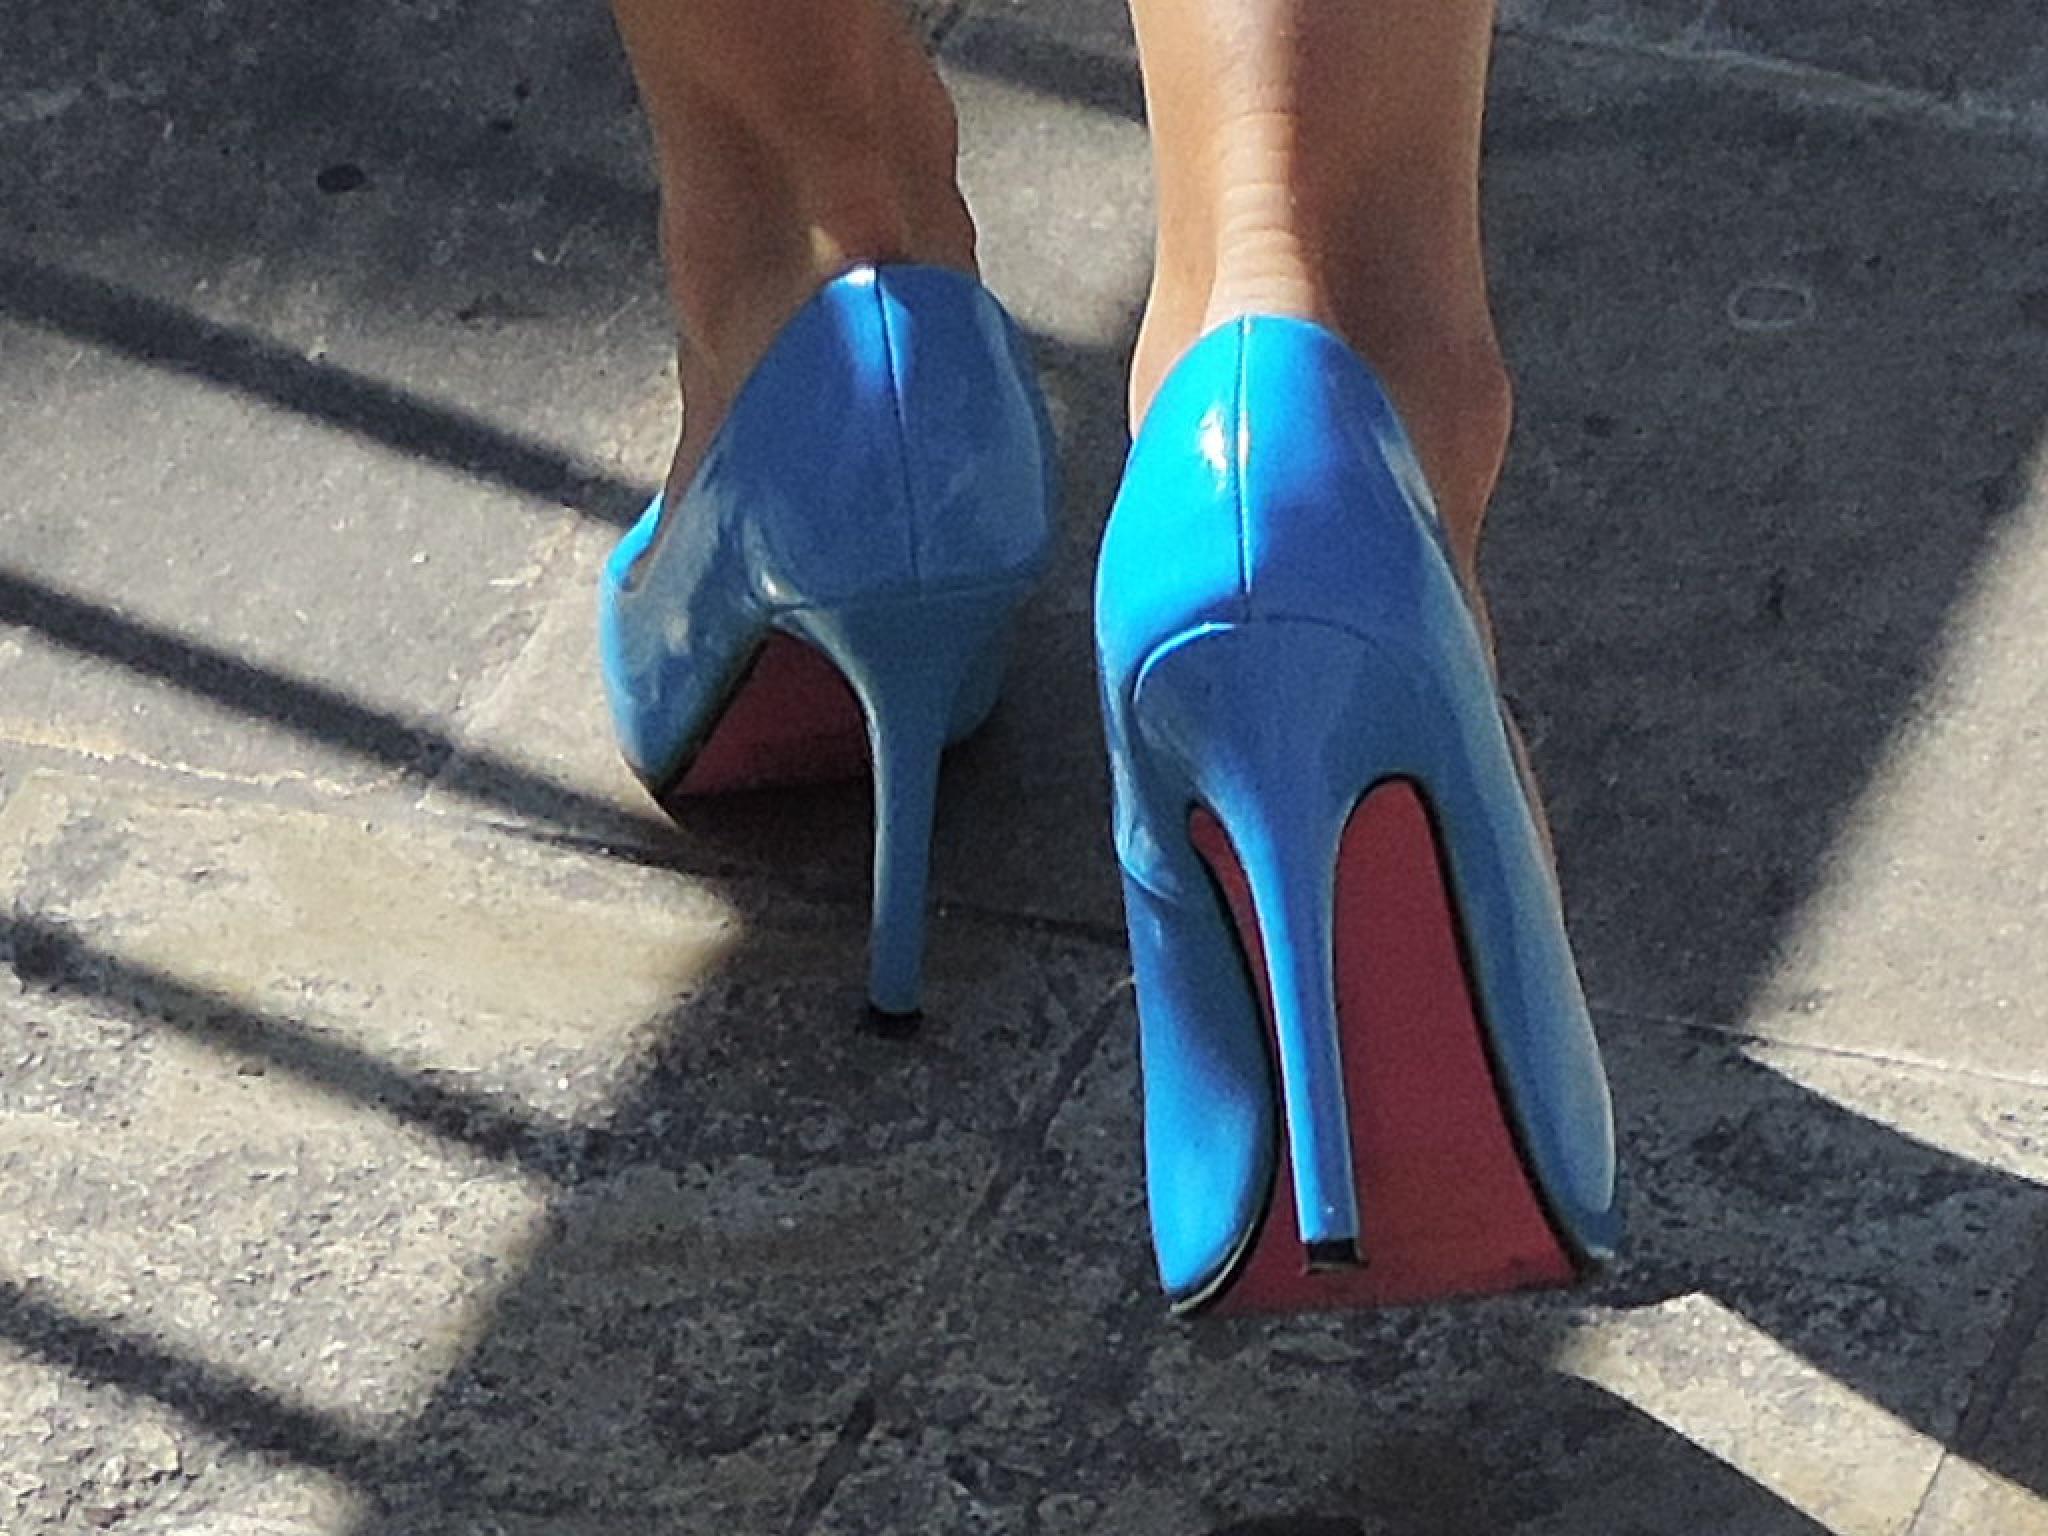 High heels by carmelo